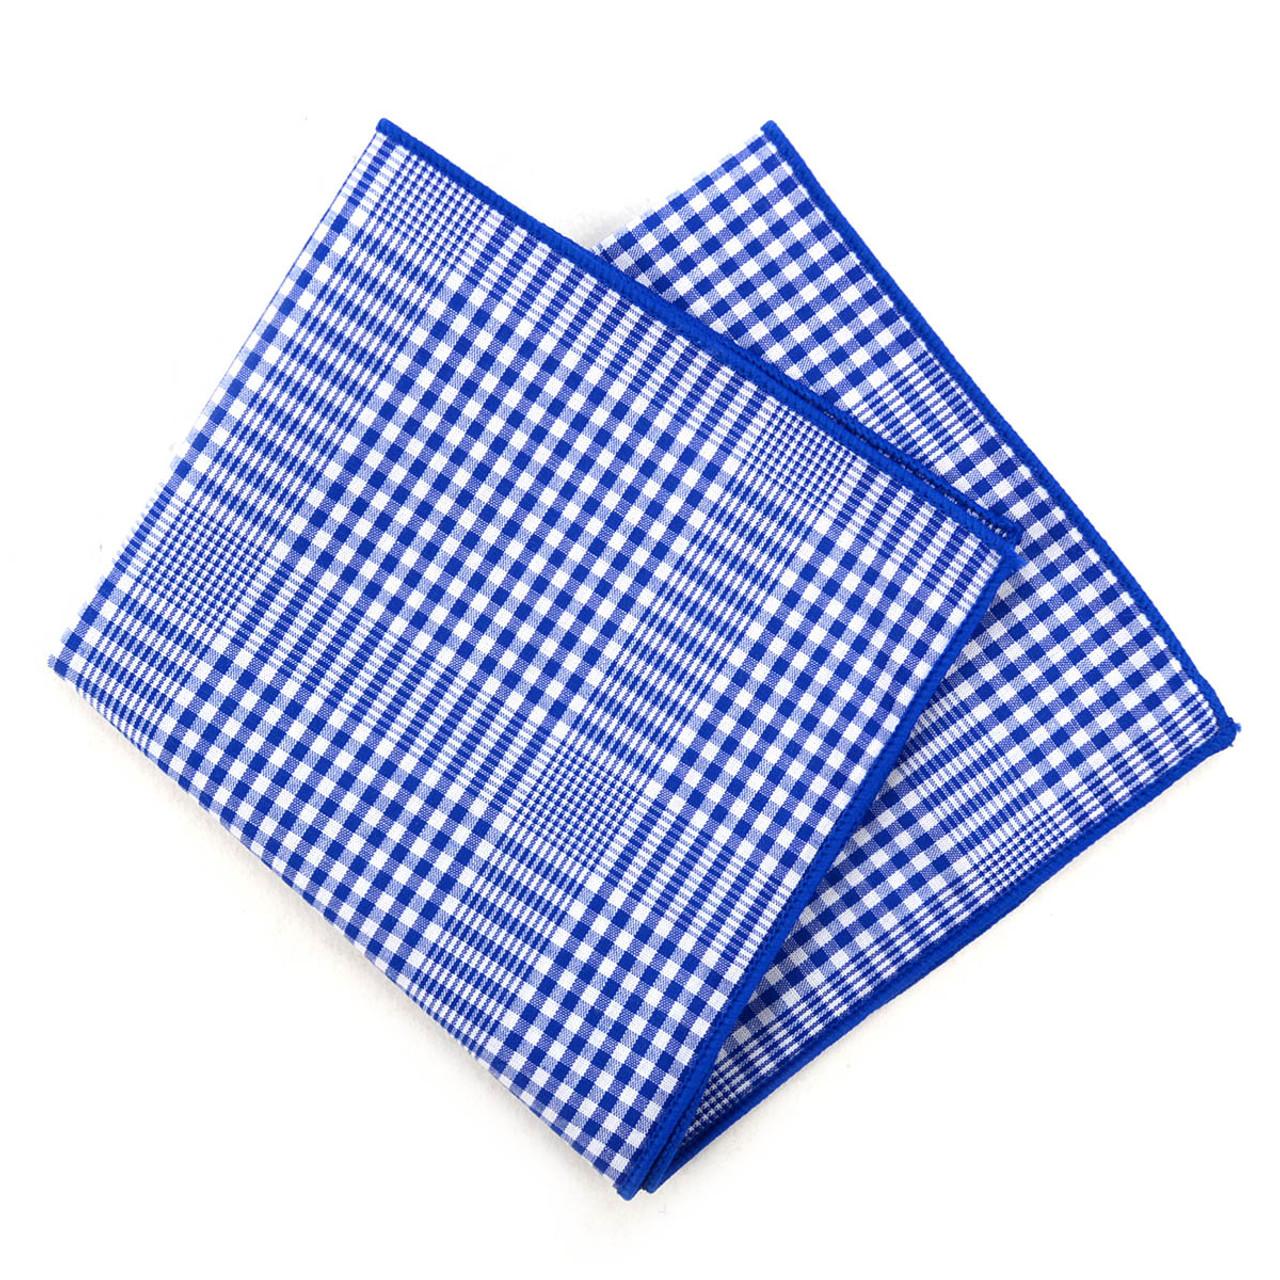 Slate Grey /& Blue Birdseye Check Pocket Square Handkerchief